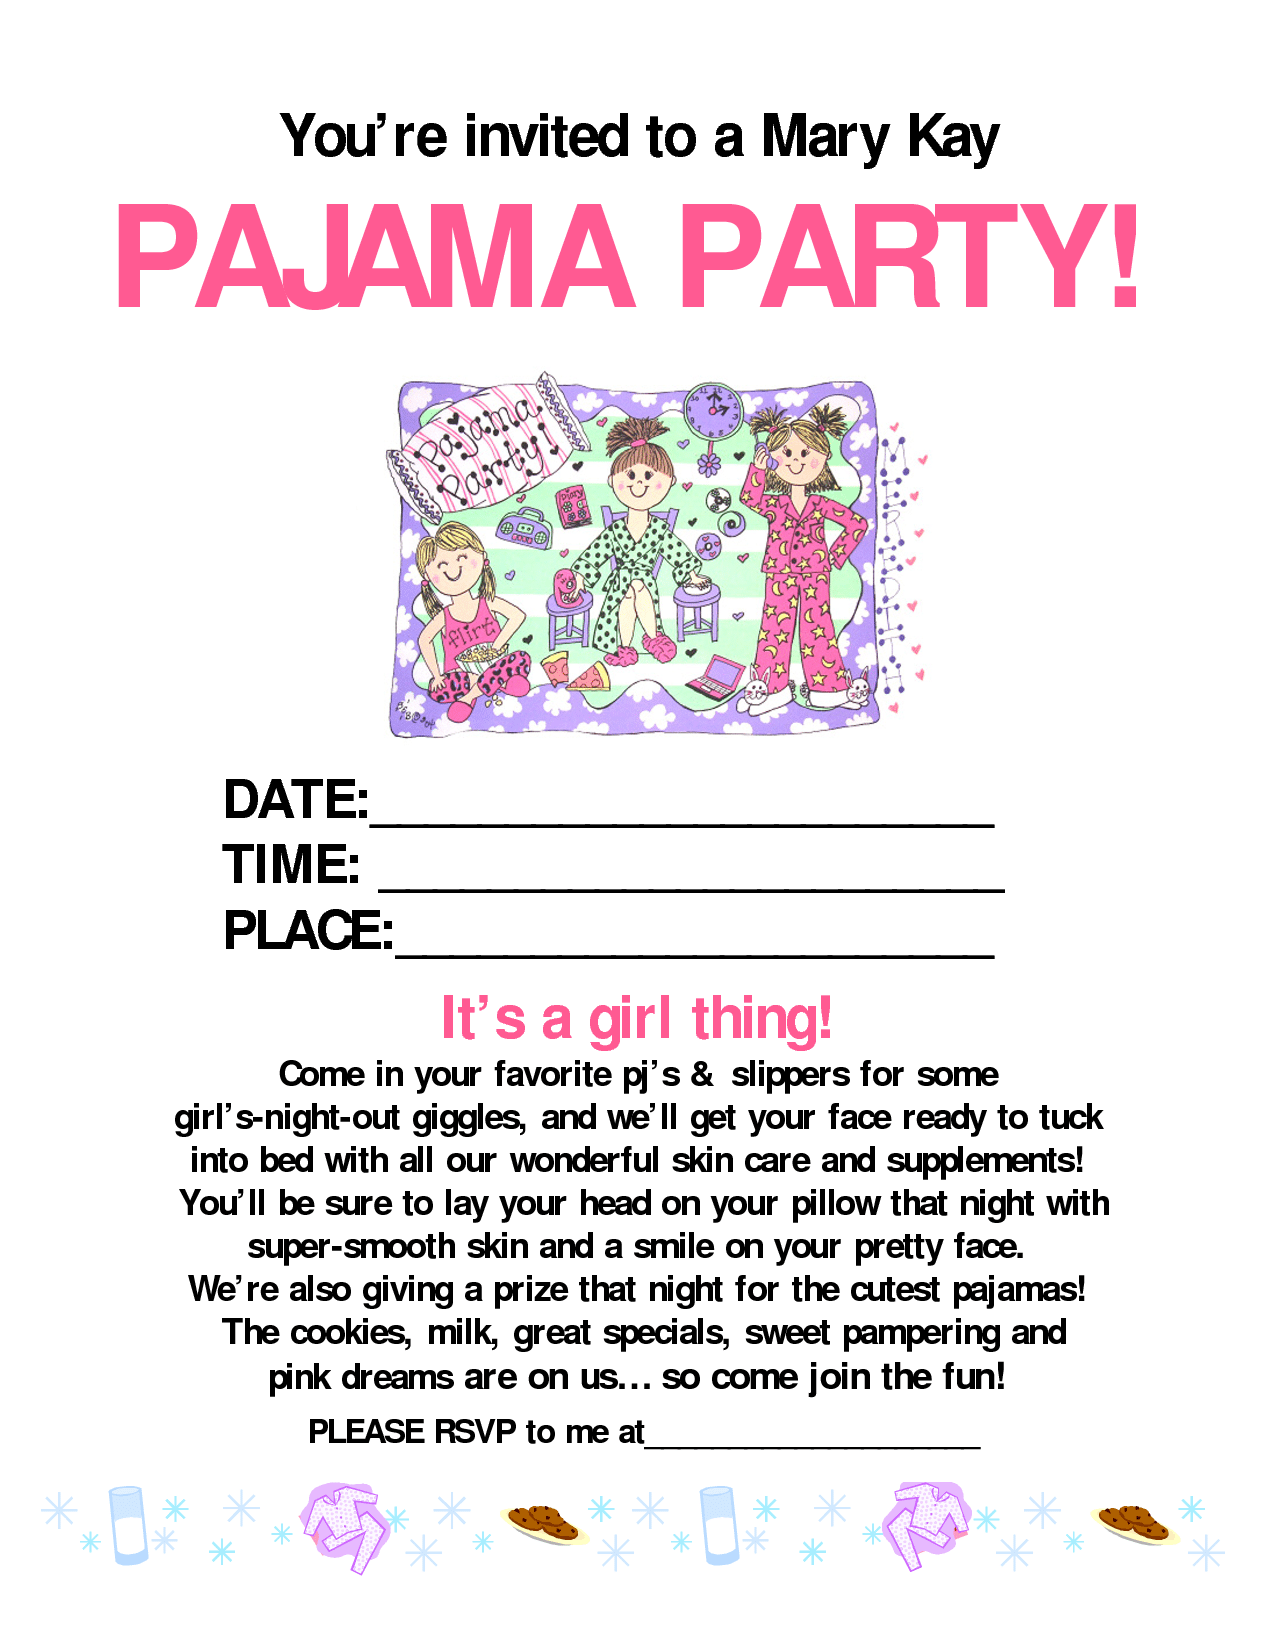 Mary Kay Party Invitations was great invitations sample